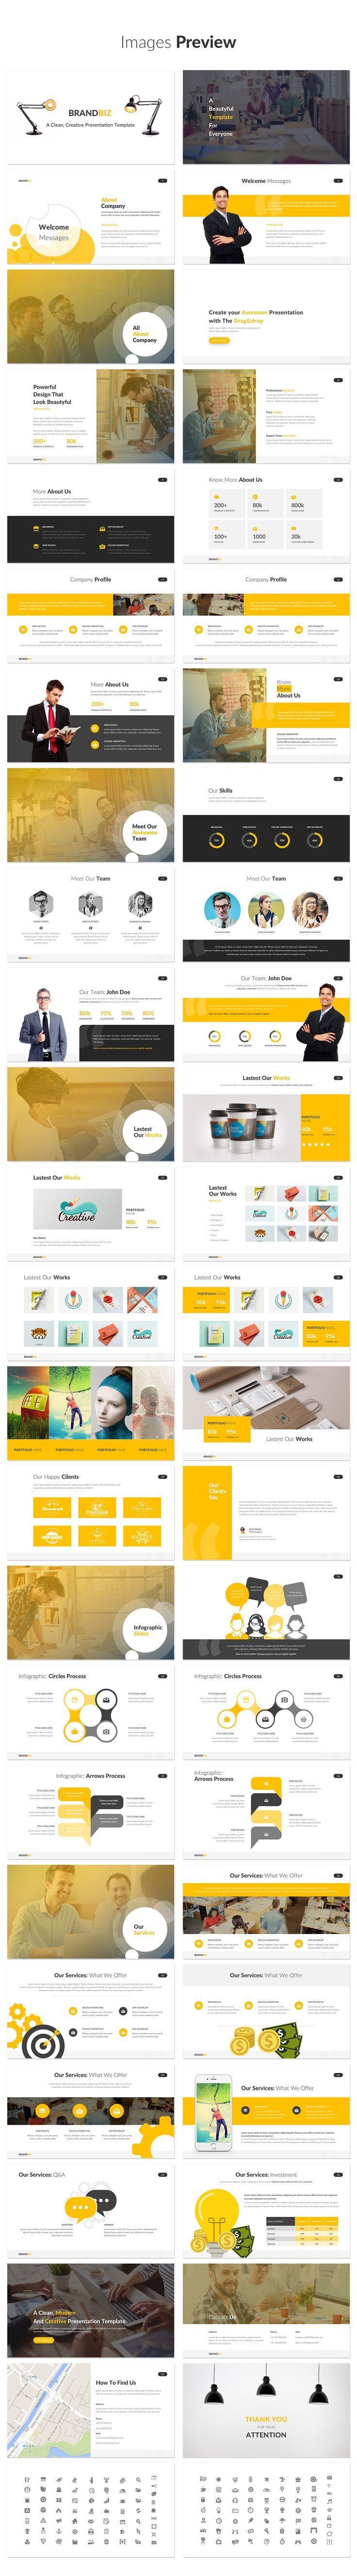 15 best ppt template images on pinterest editorial design page brandbiz powerpoint template powerpoint templates toneelgroepblik Image collections